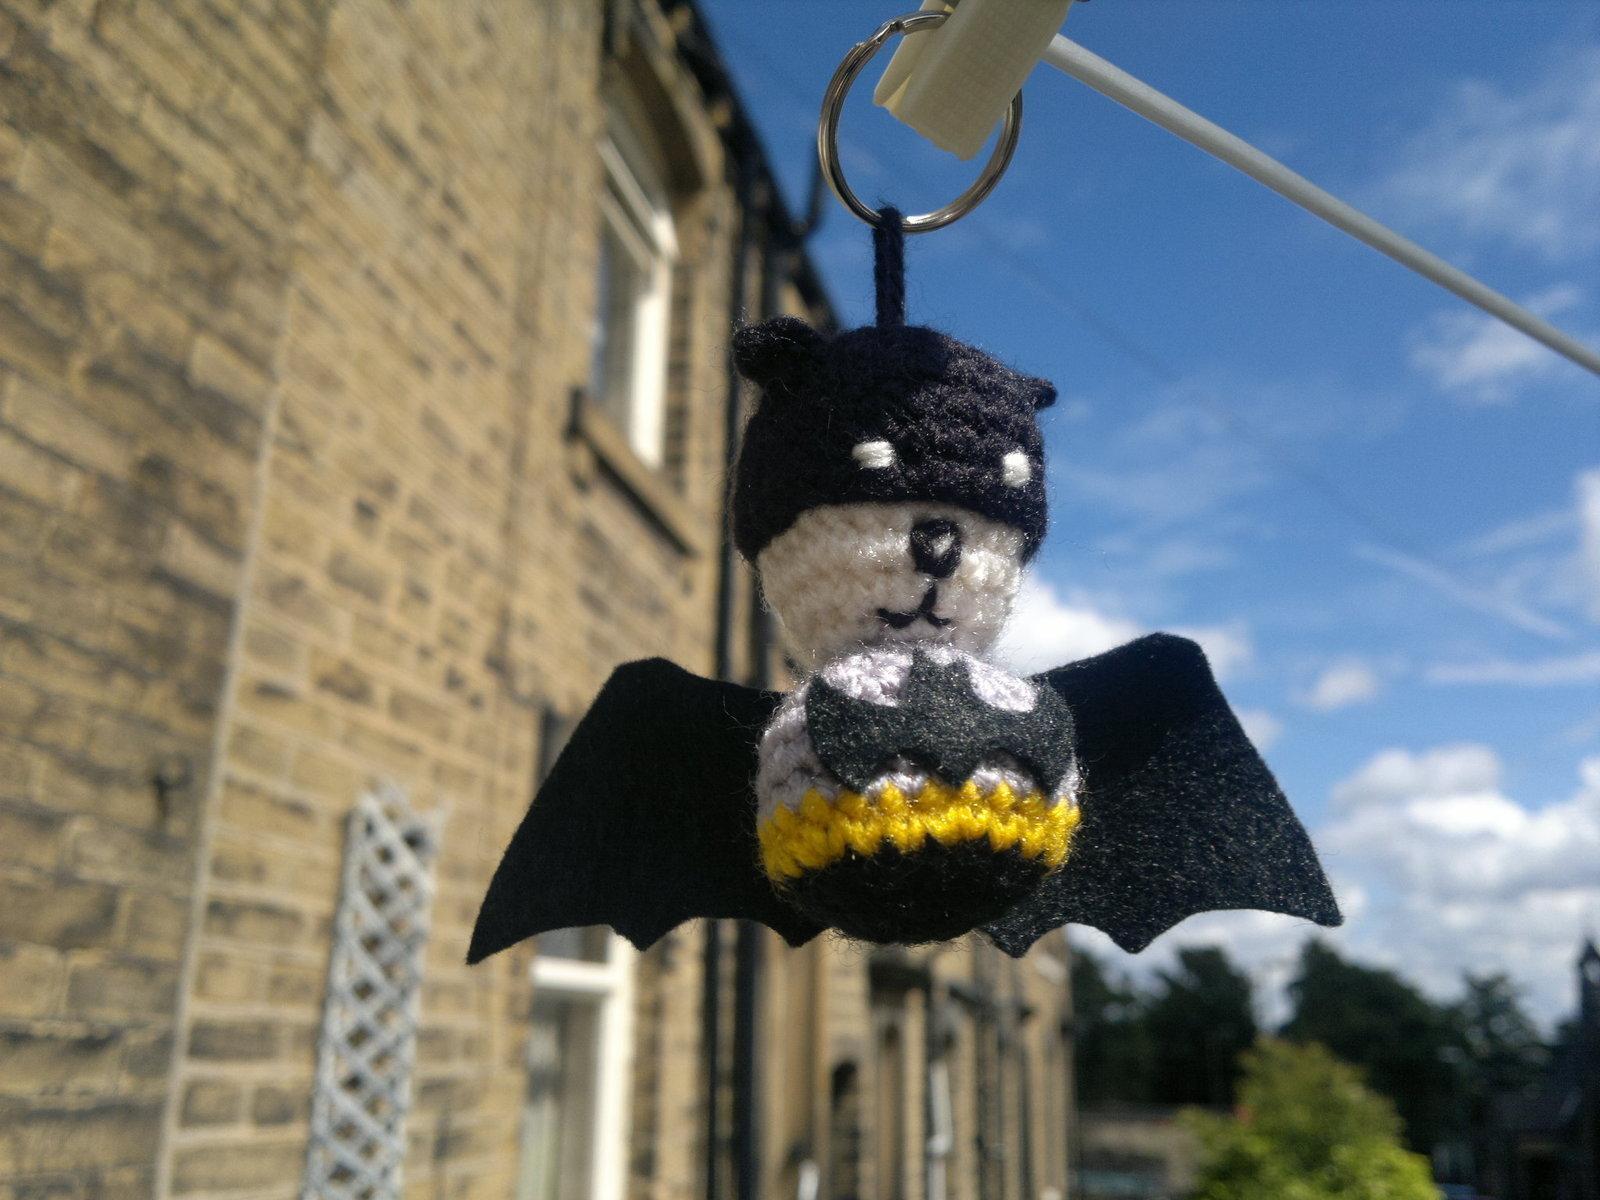 Batman amigurumi tejido a crochet amigurumi Batman 1 - YouTube | 1200x1600